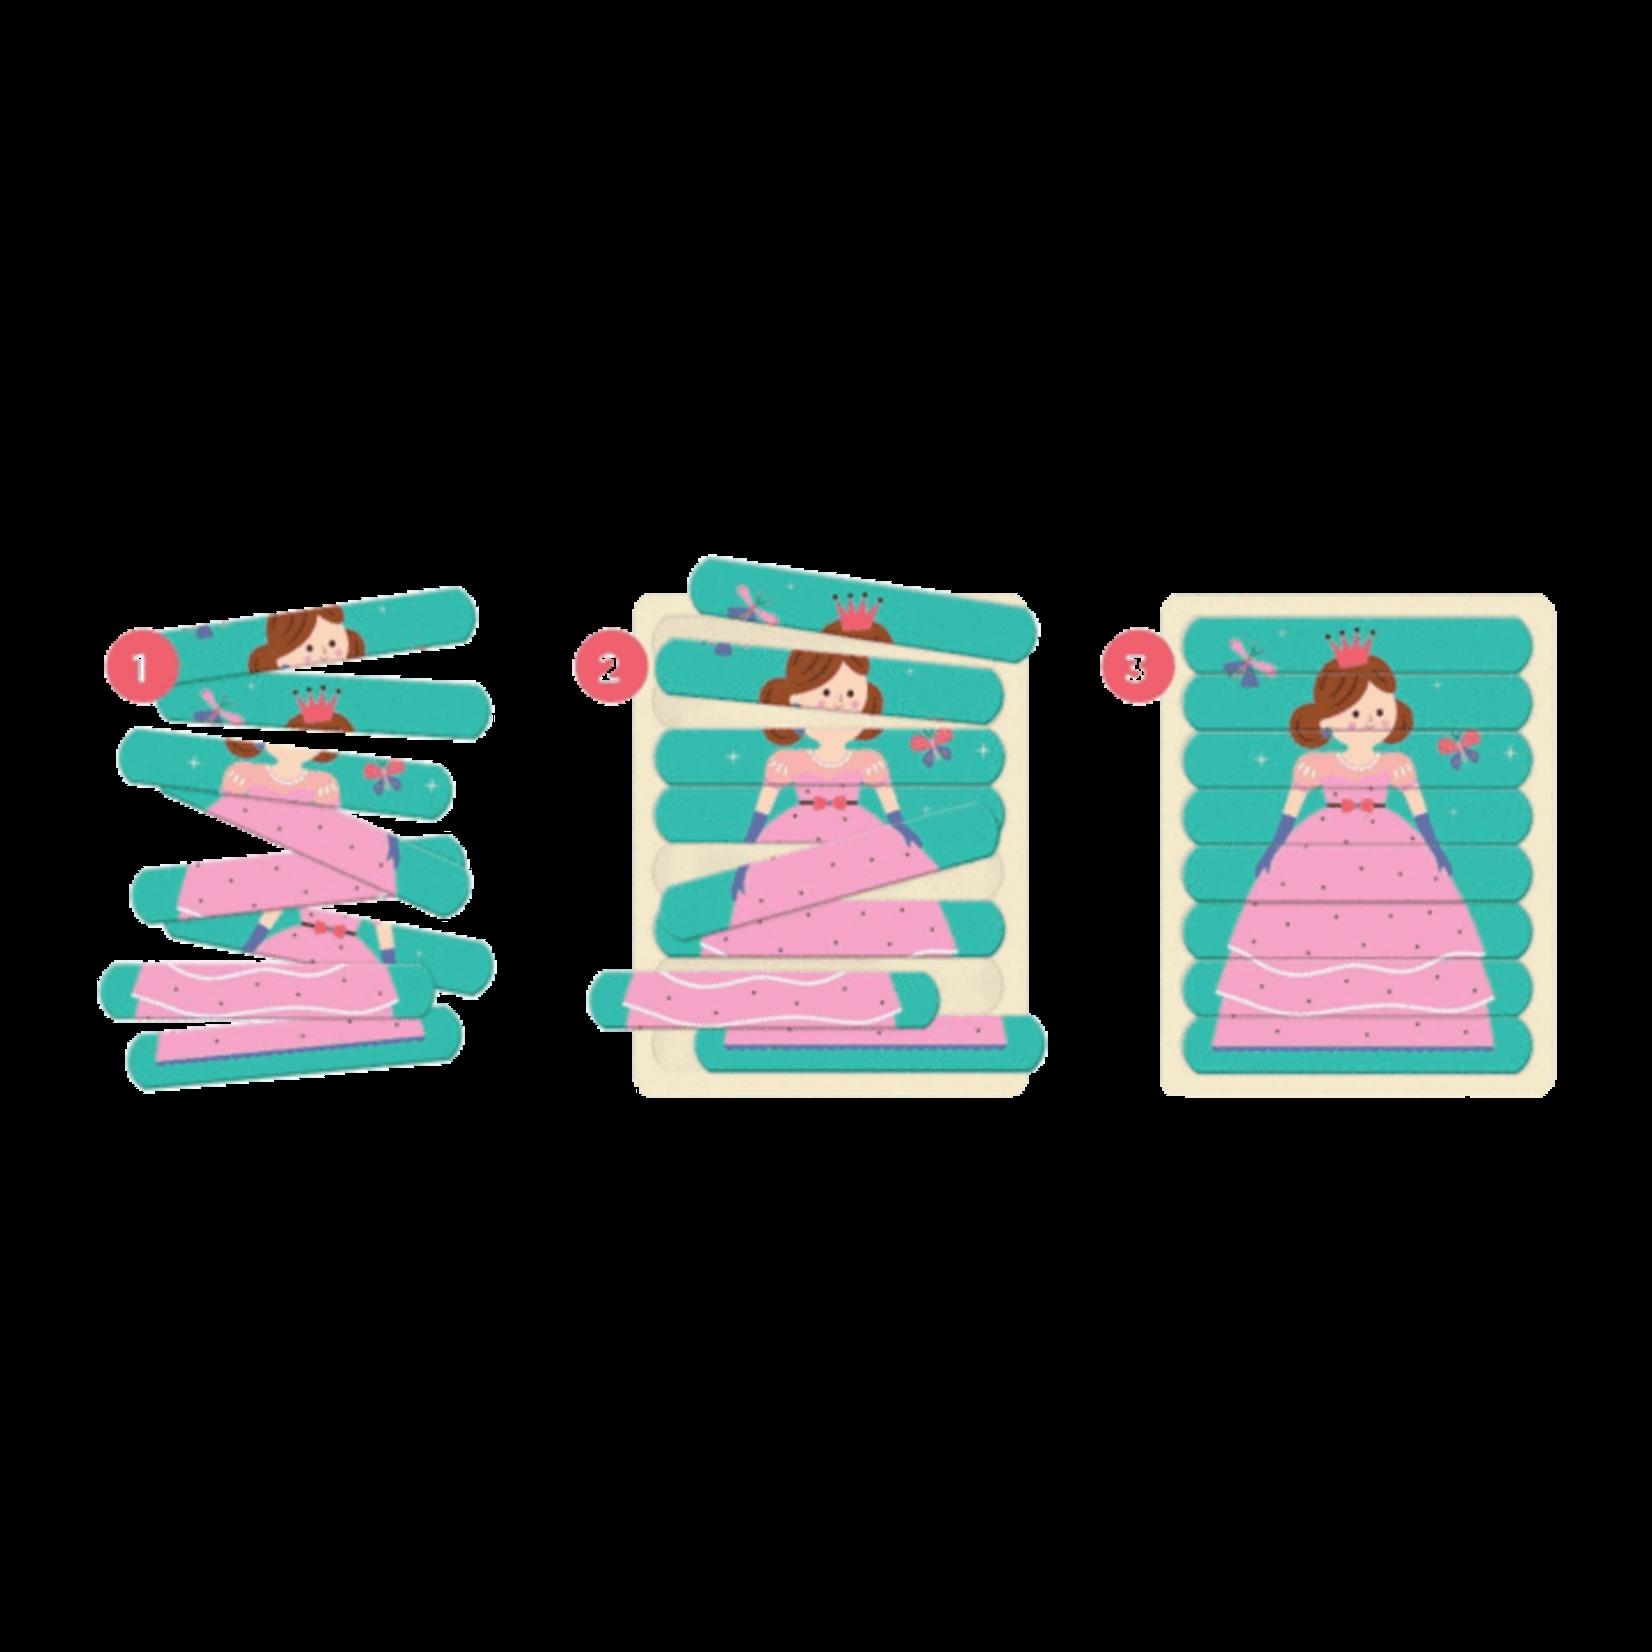 Mudpuppy Enchanting Princess Puzzle Sticks 6 Pack 8pc